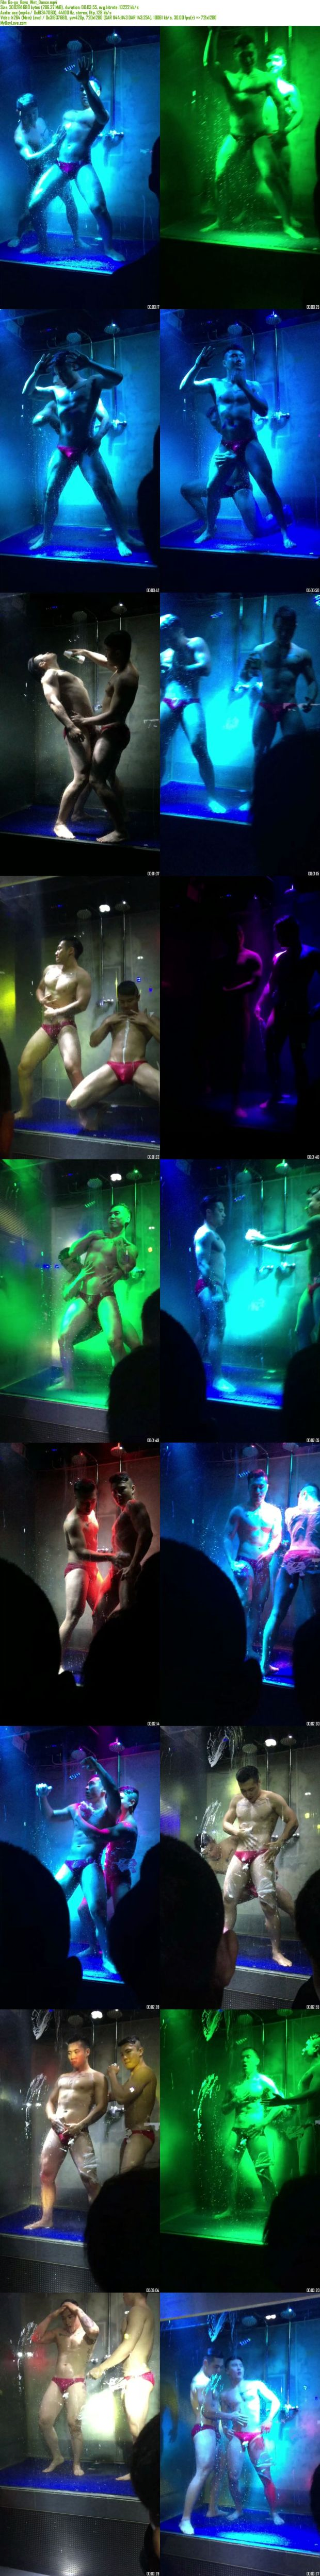 Chinese maleshow – Amateur Contribution – Go-go Boys Wet Dance 性感肌肉猛男水中熱舞